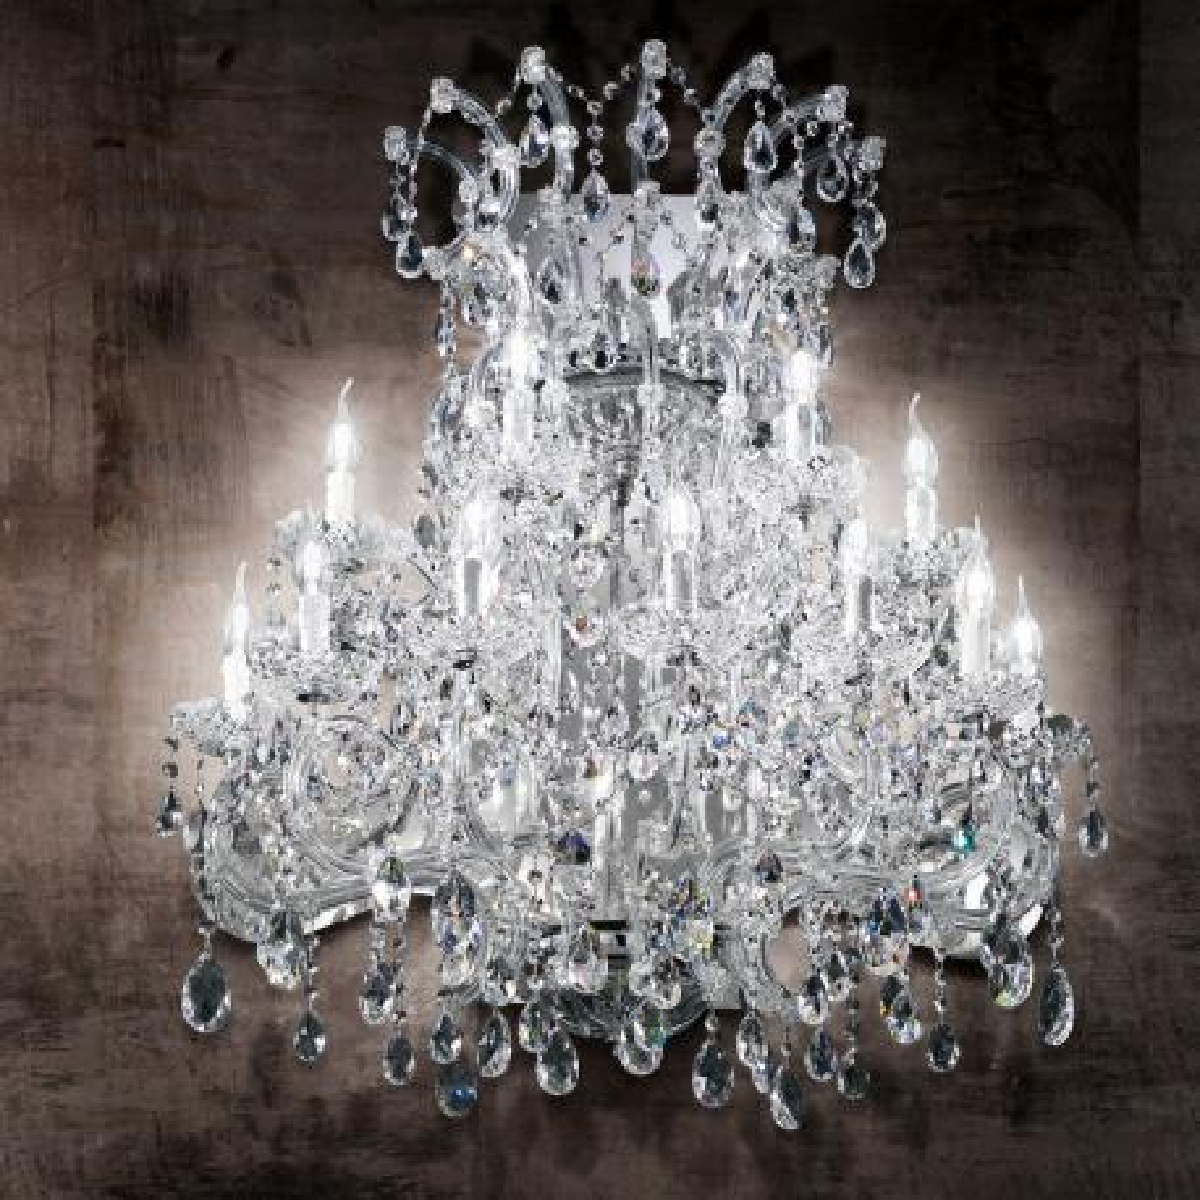 """Canaletto"" aplique veneciano de pared en cristal - 11 luces - transparente"